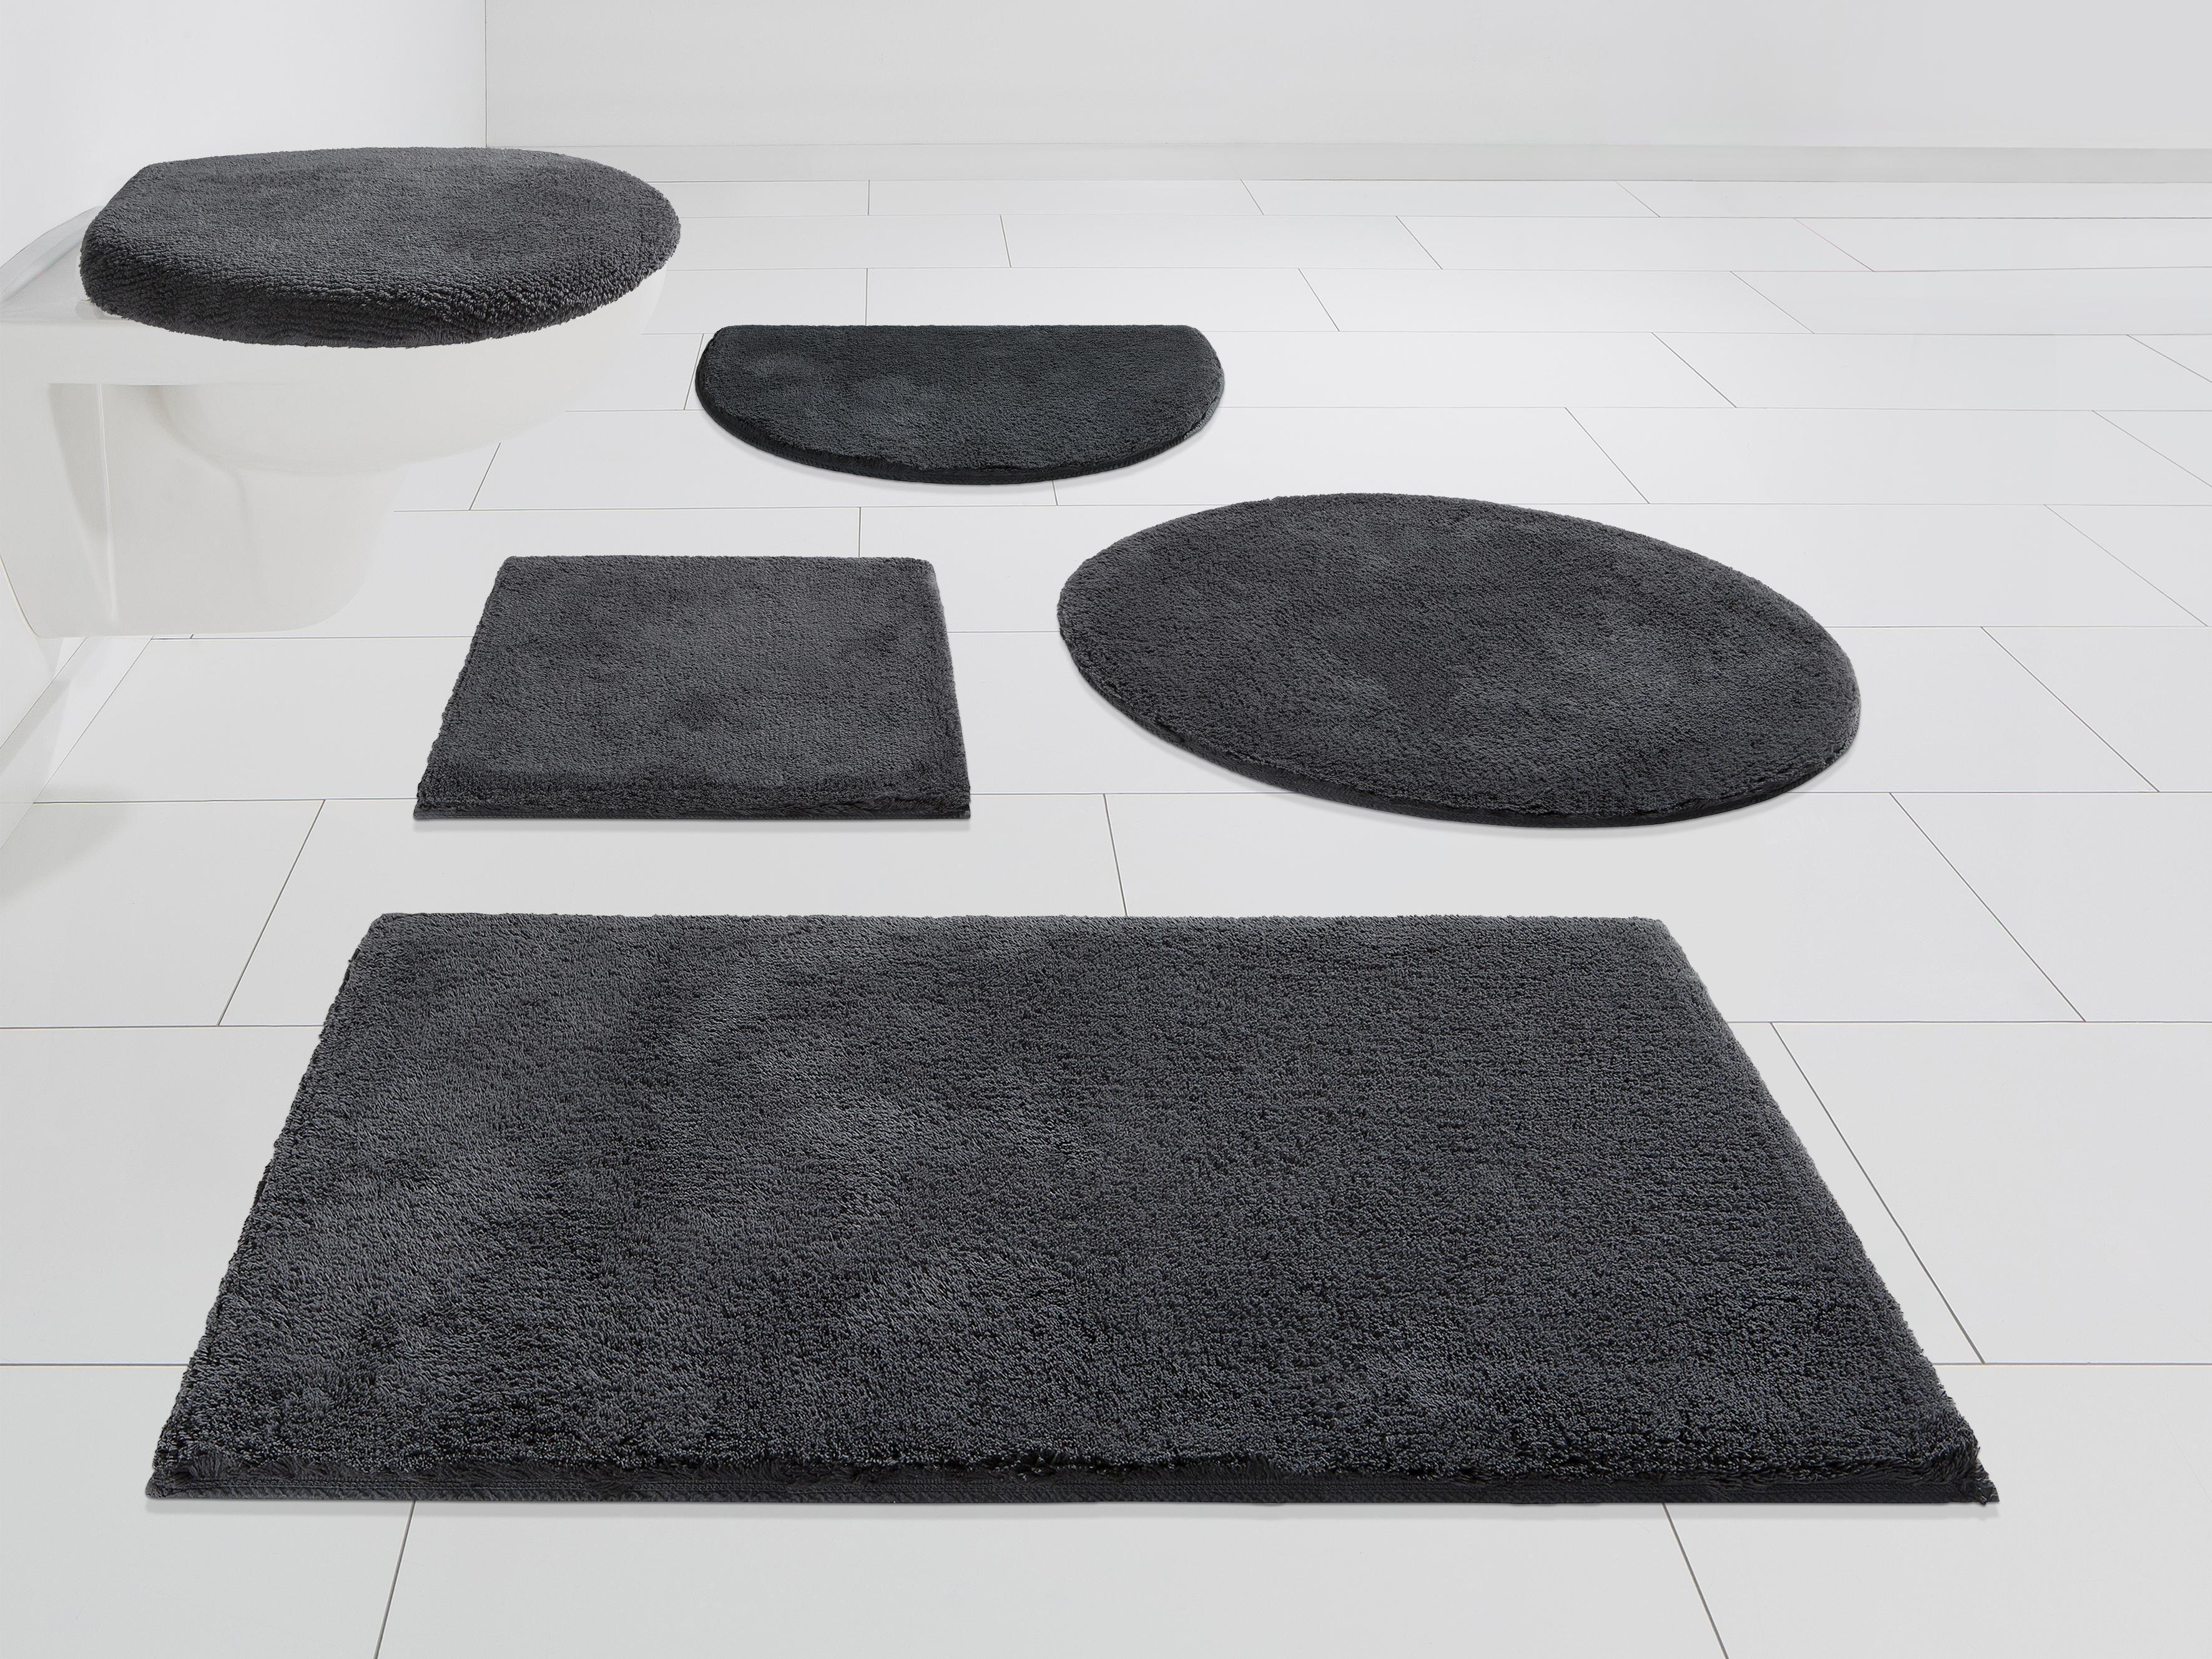 Kleine Wolke Exklusiv Badmat »Lillian«, hoogte 20 mm, met antislip-coating online kopen op otto.nl